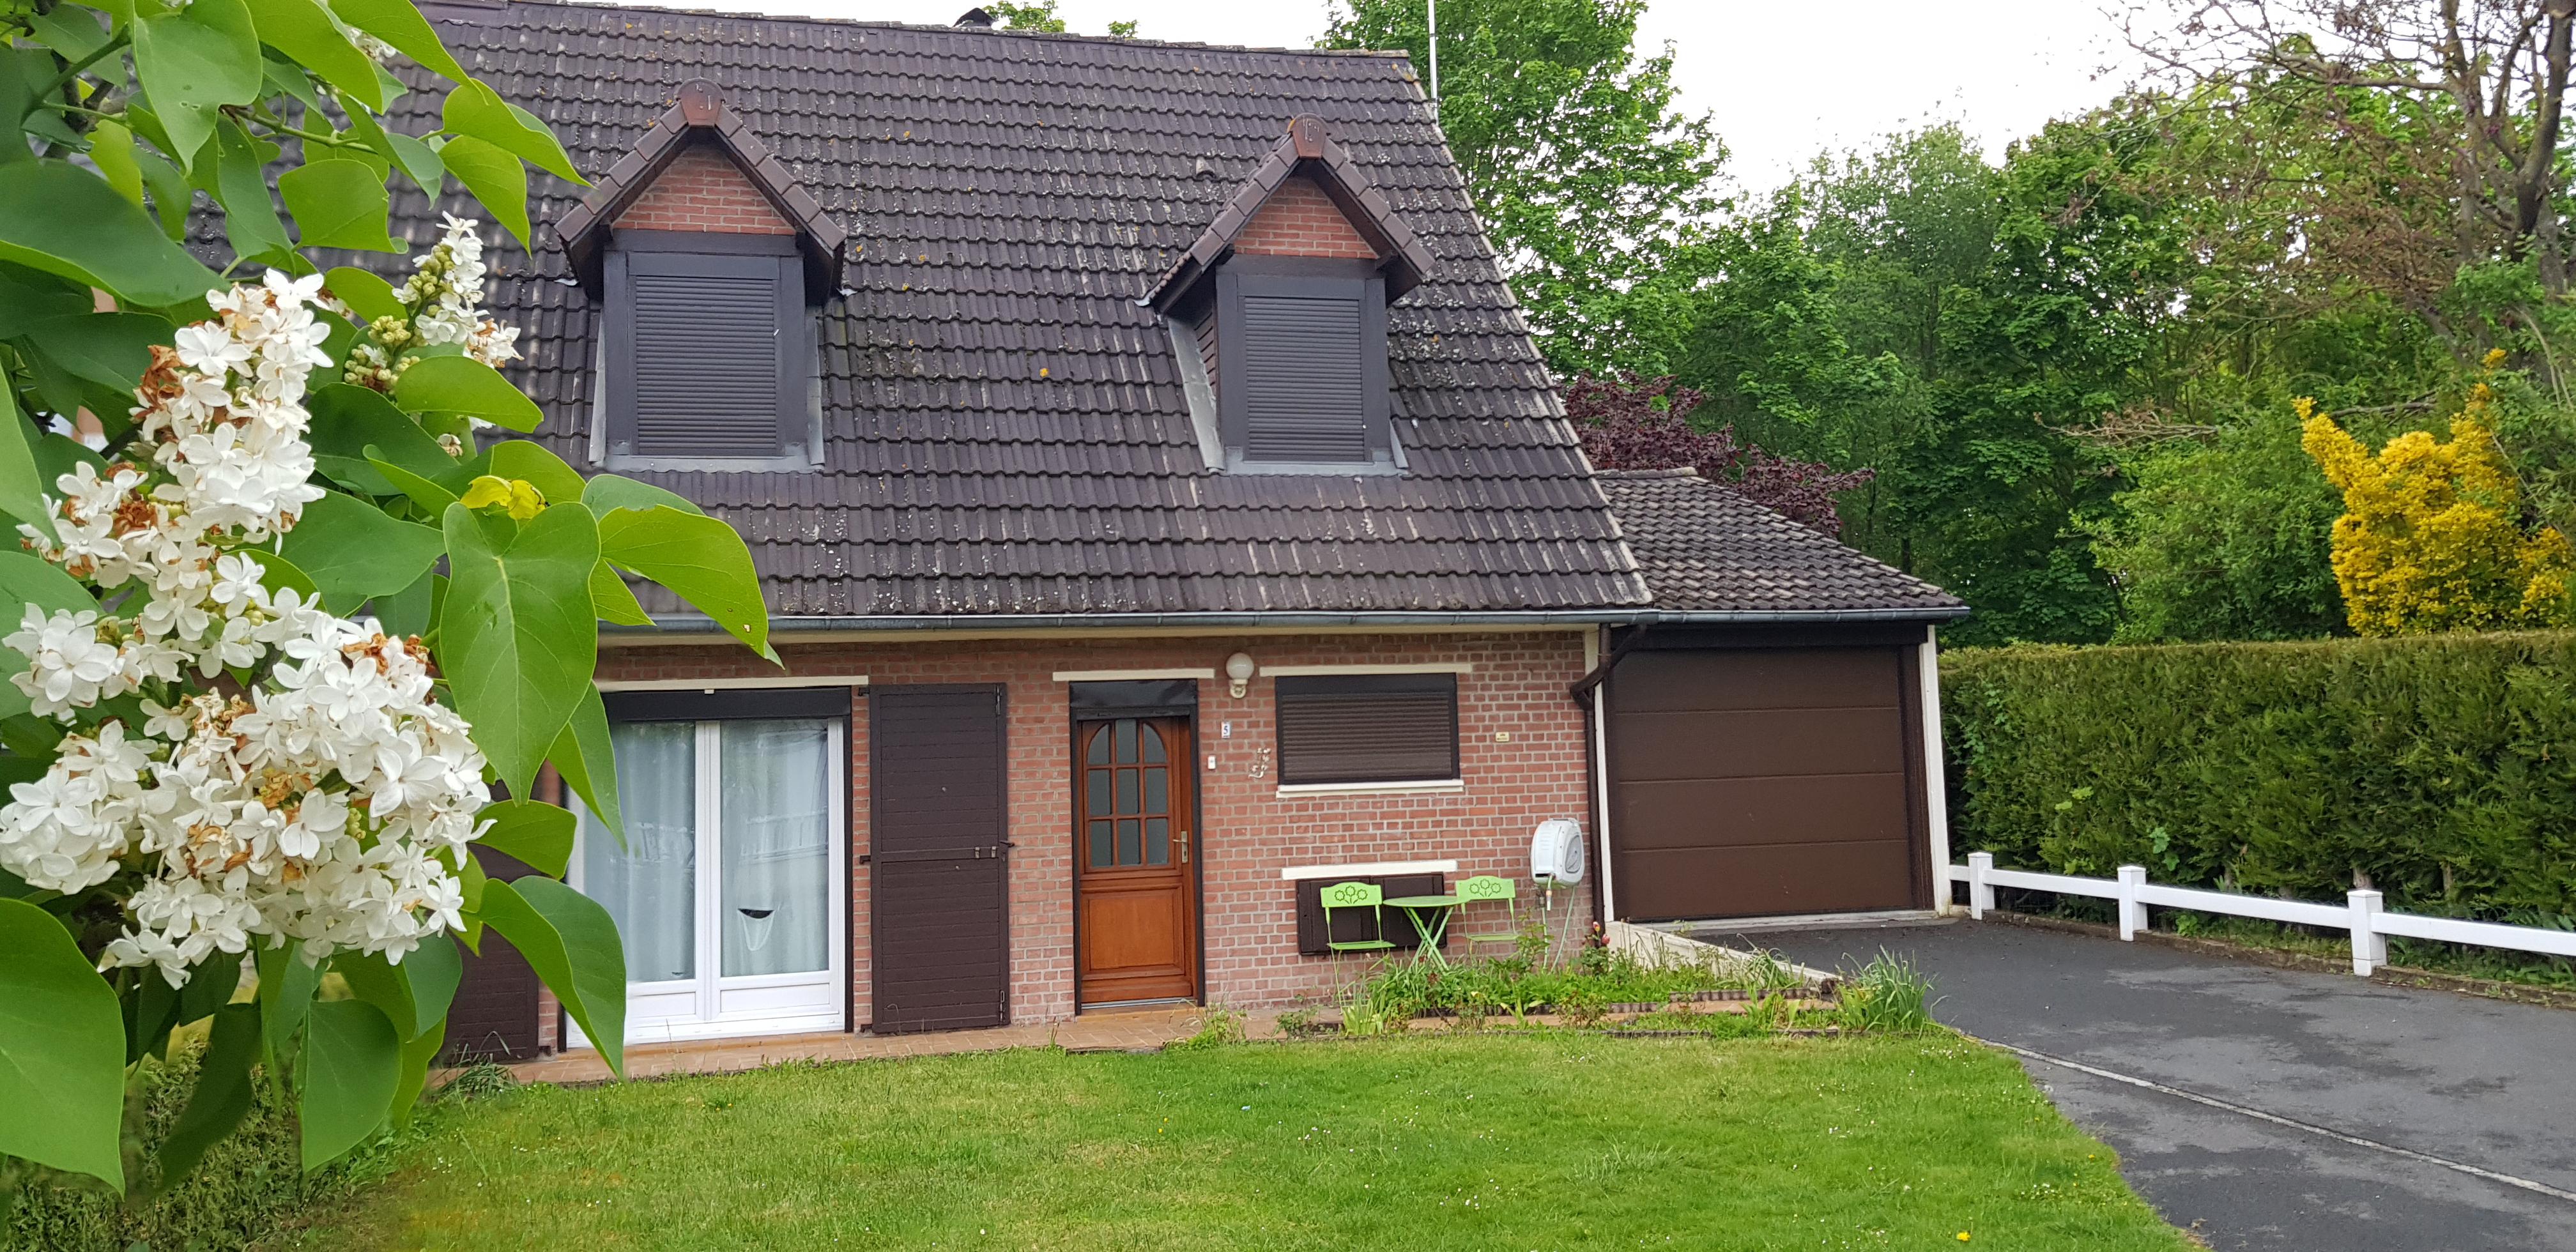 115 m² - 208 000€